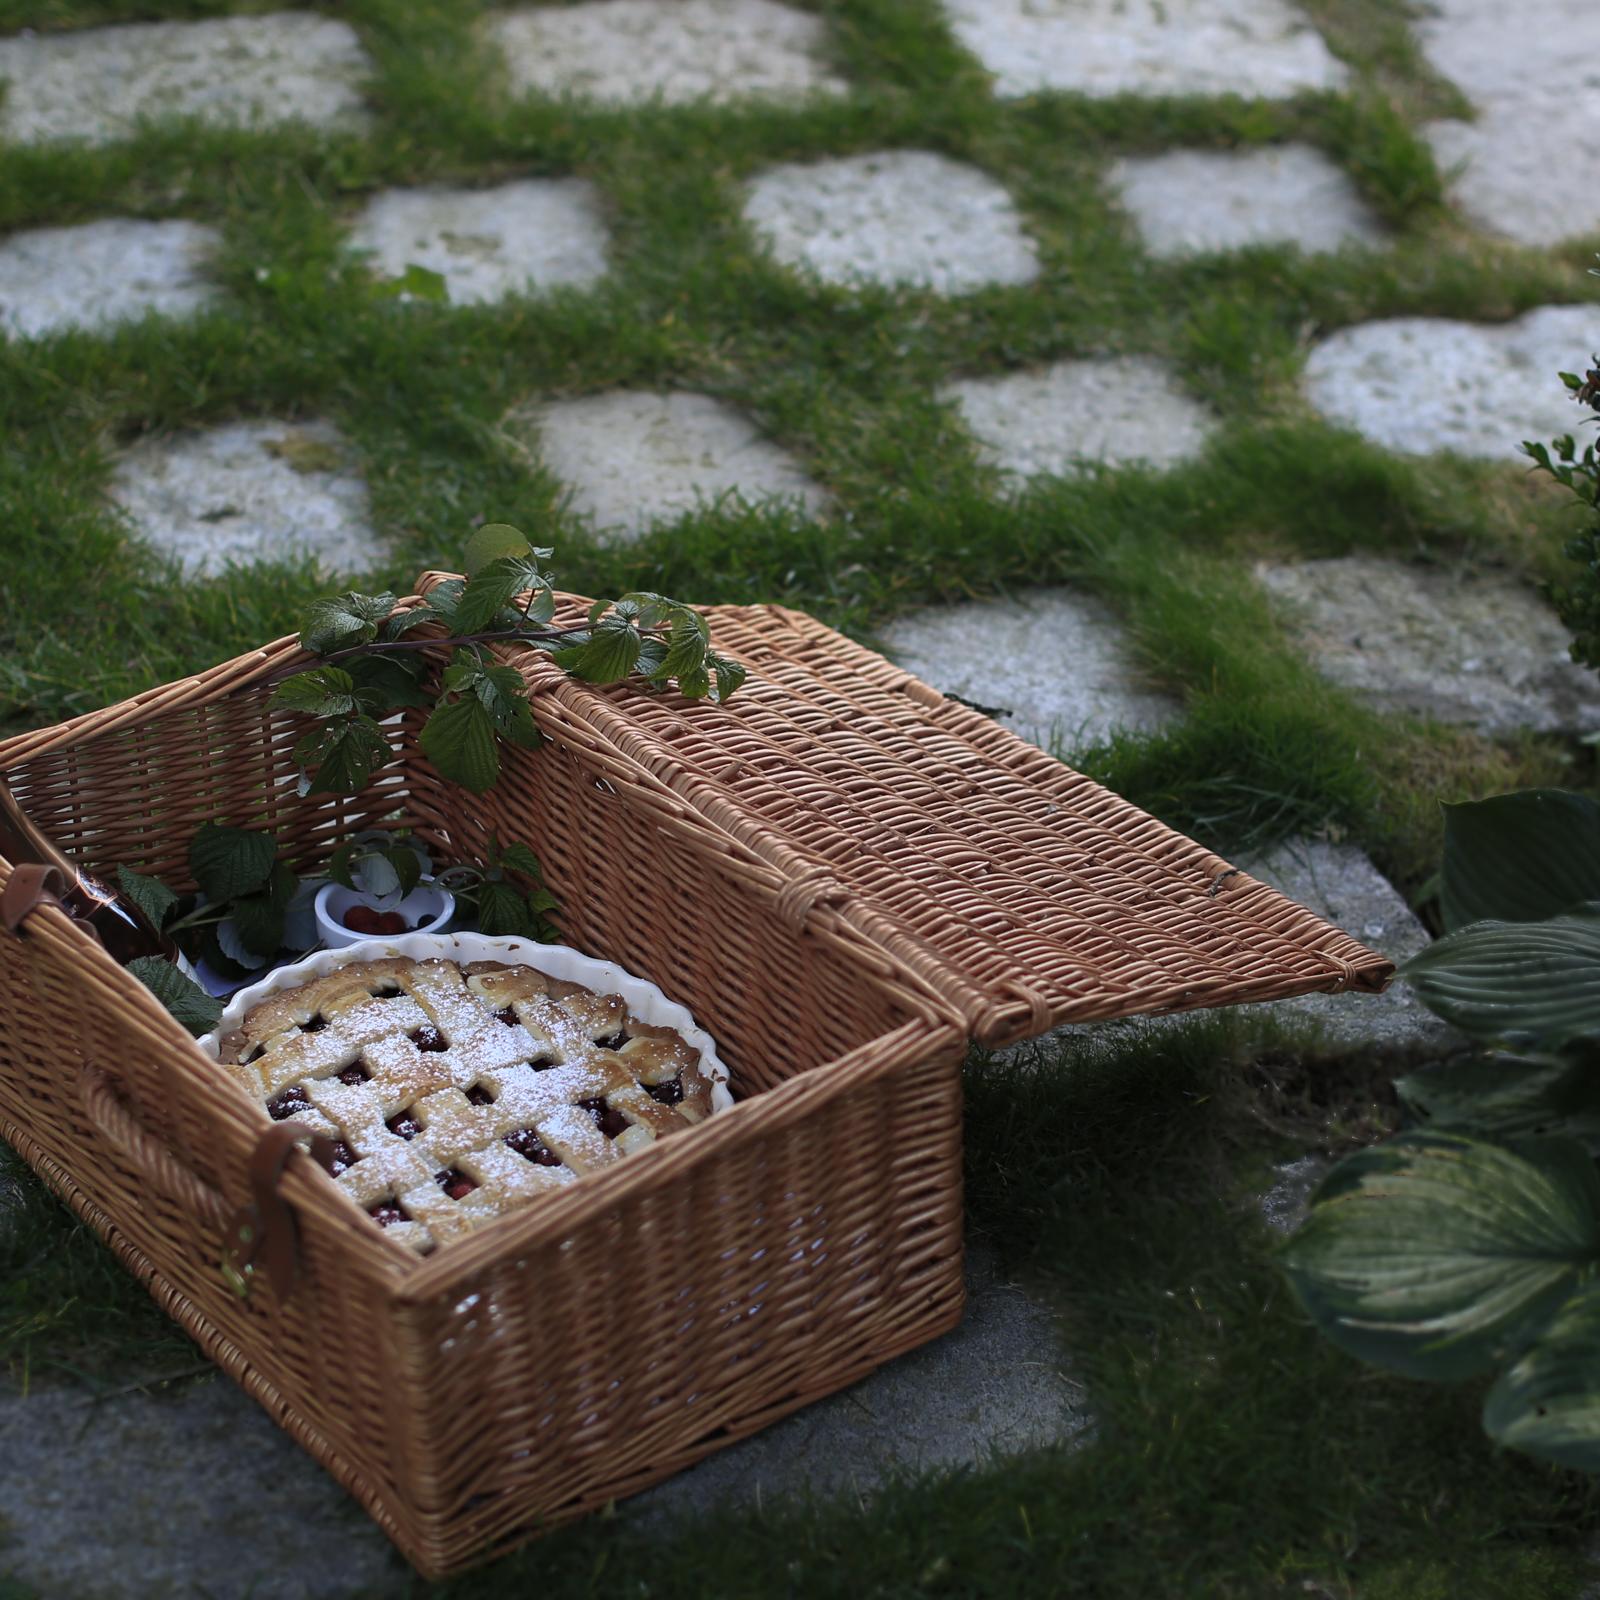 Pie for picknick